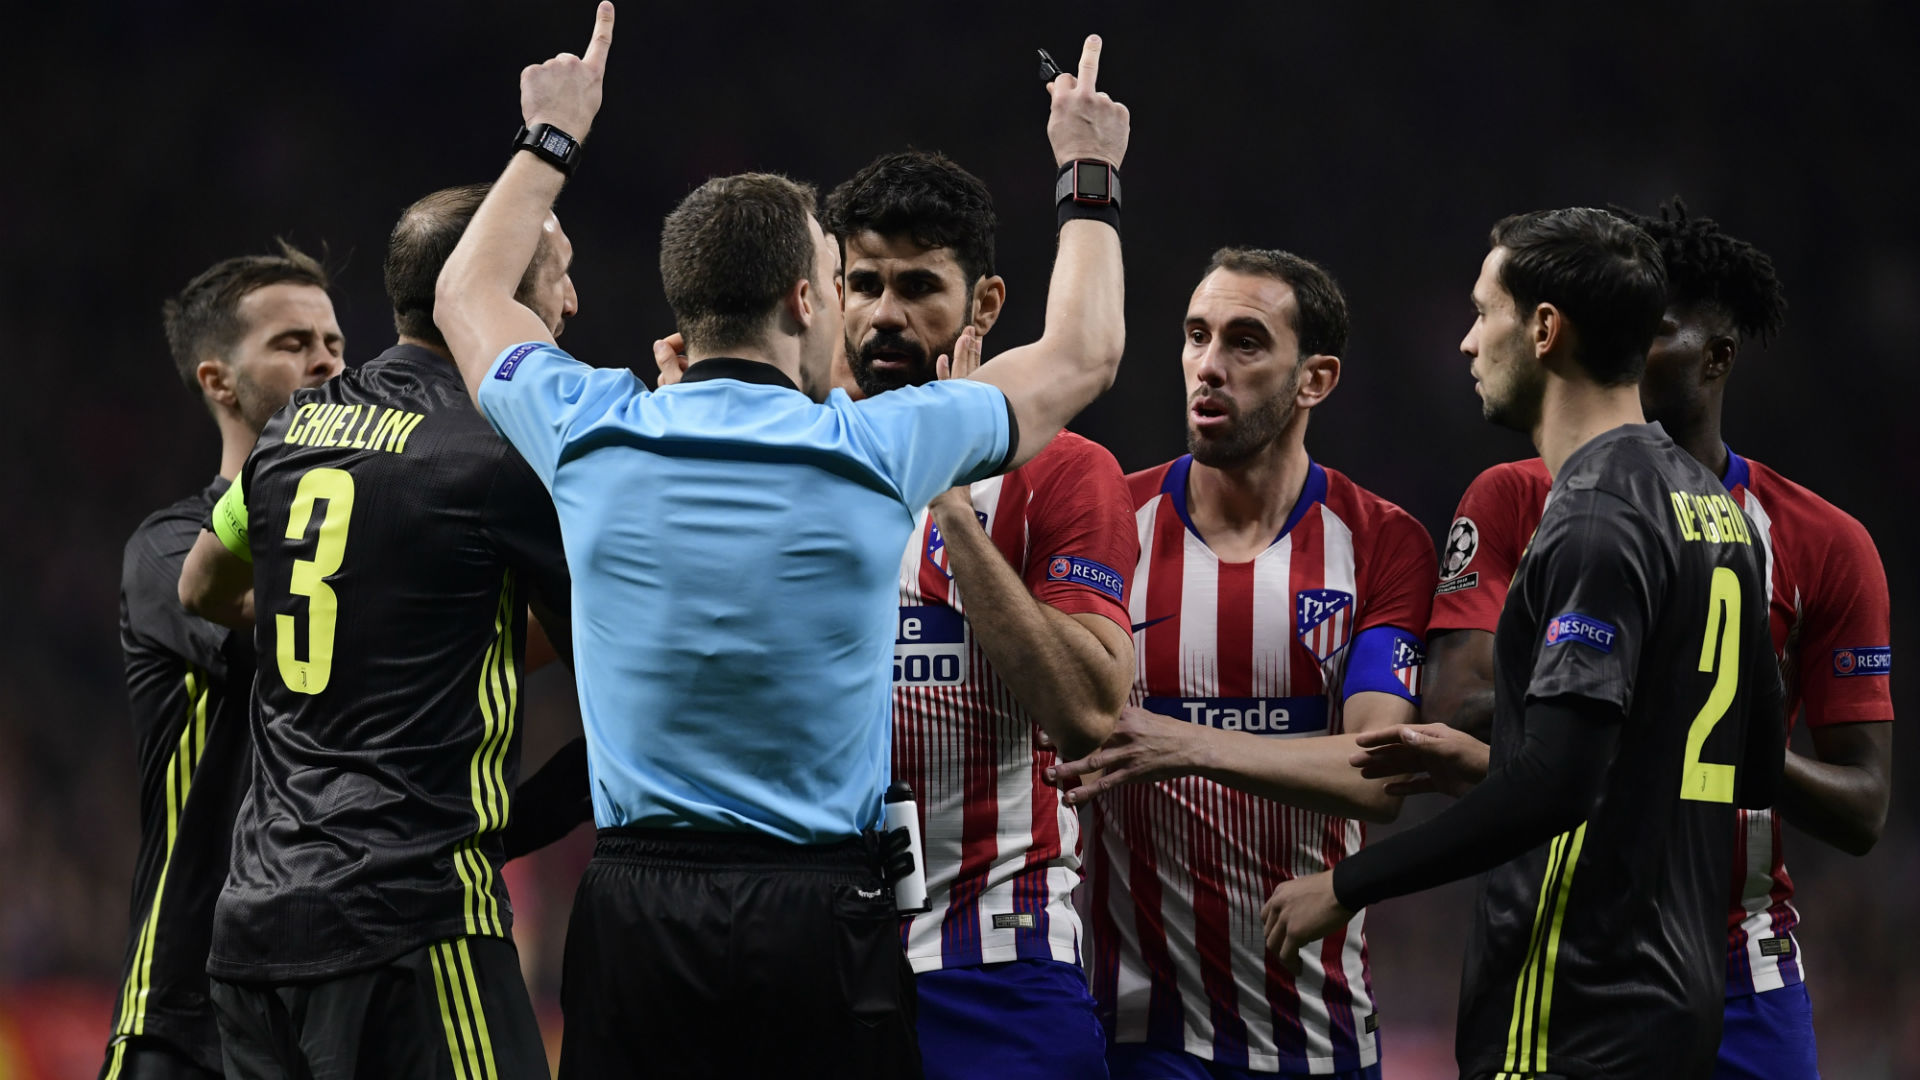 Ligue des champions: 5 infos avant Juventus Turin – Atlético Madrid